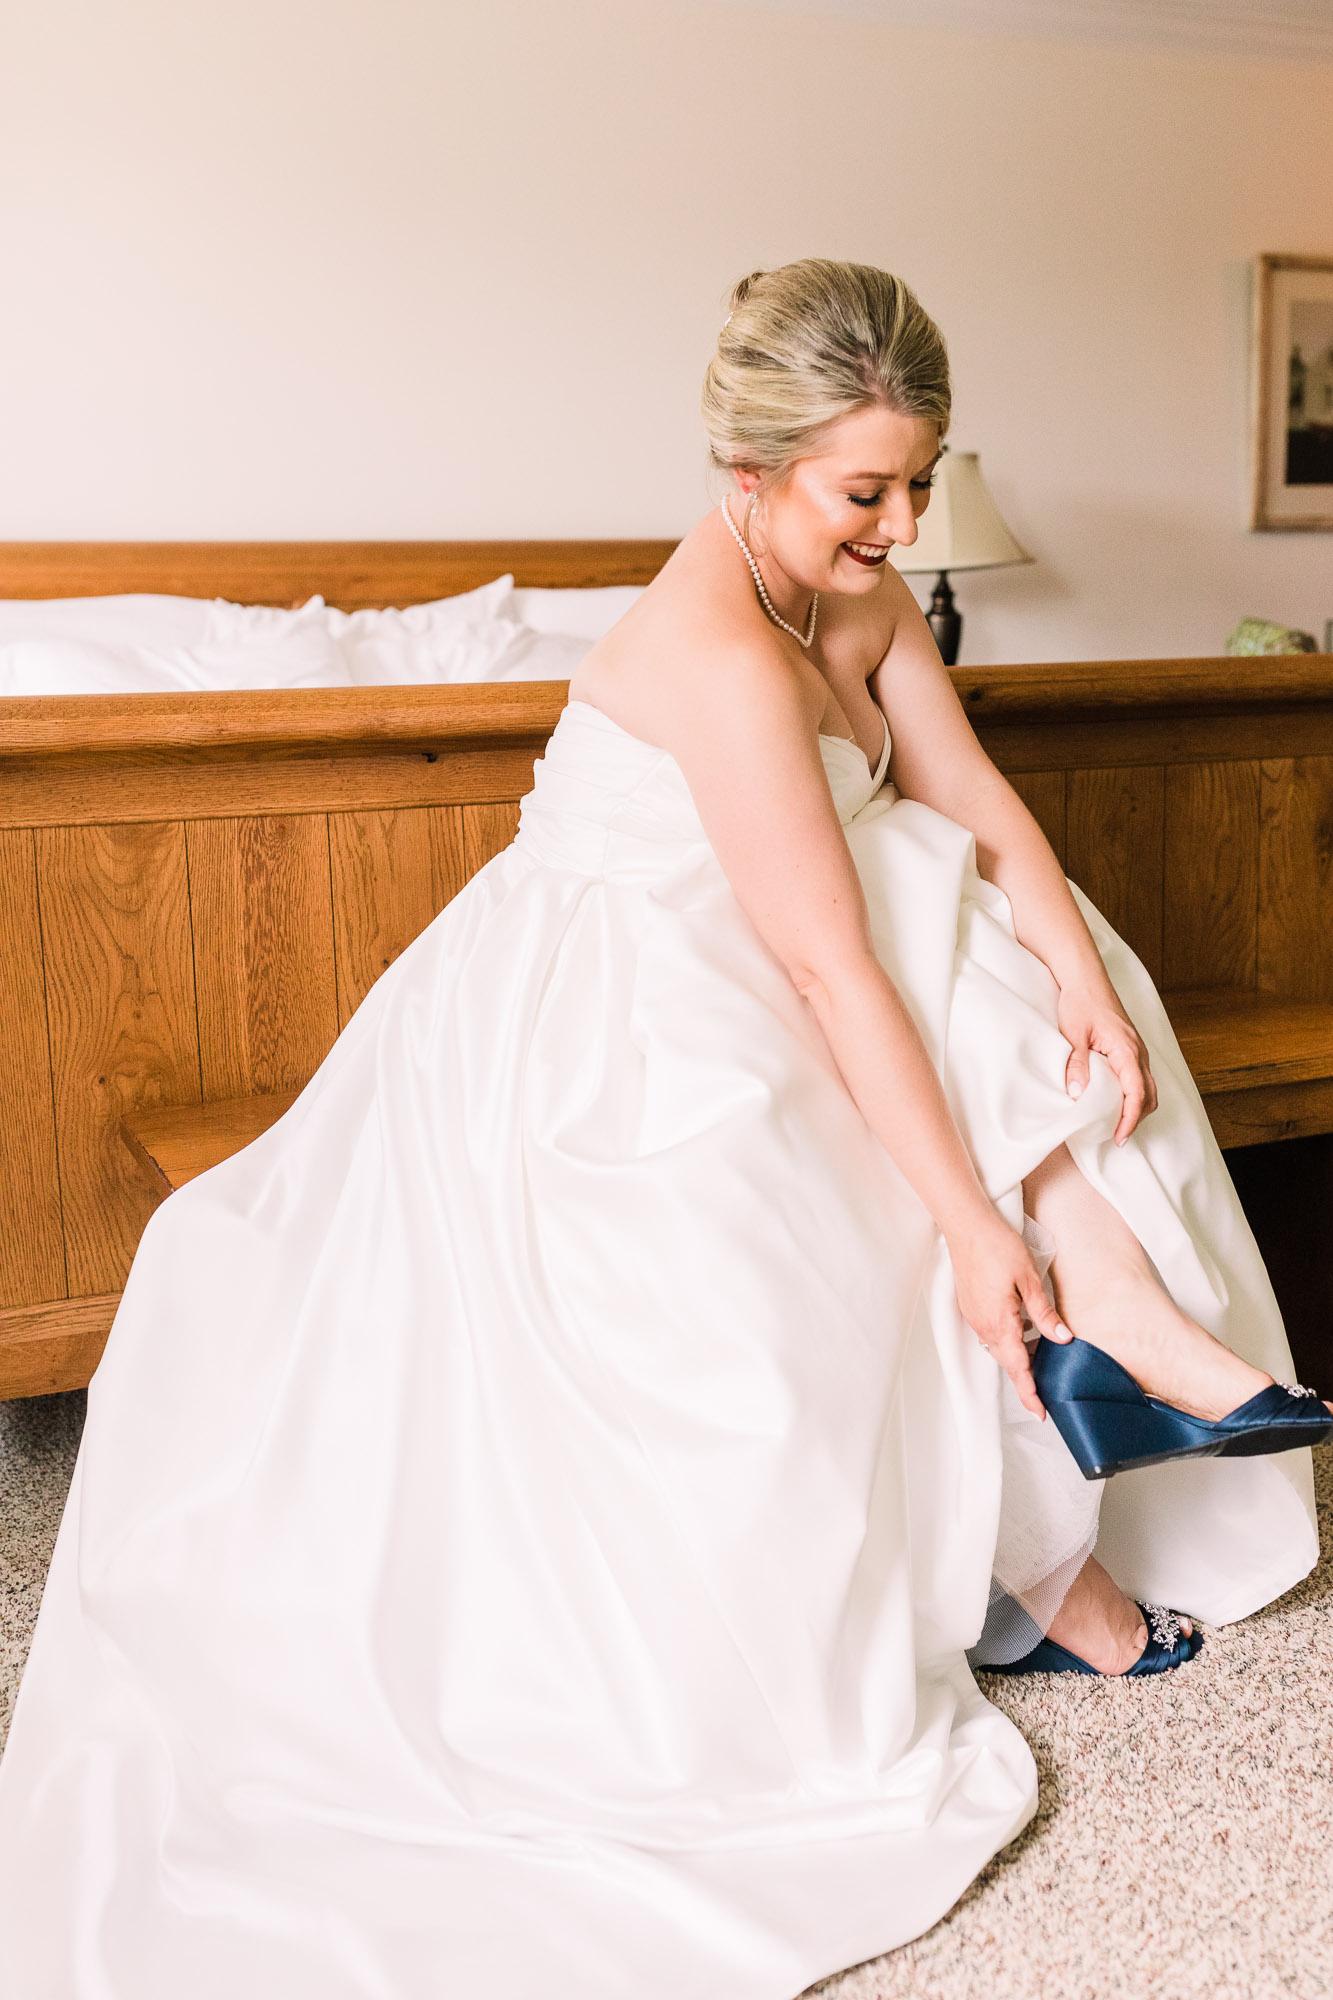 isle-of-que-wedding-6494.jpg